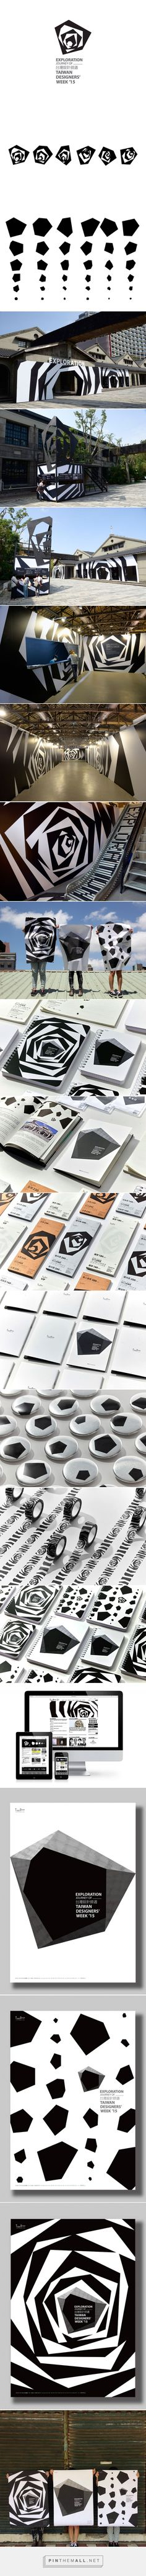 Visual identity of Taiwan designers' week 2015 on Behance